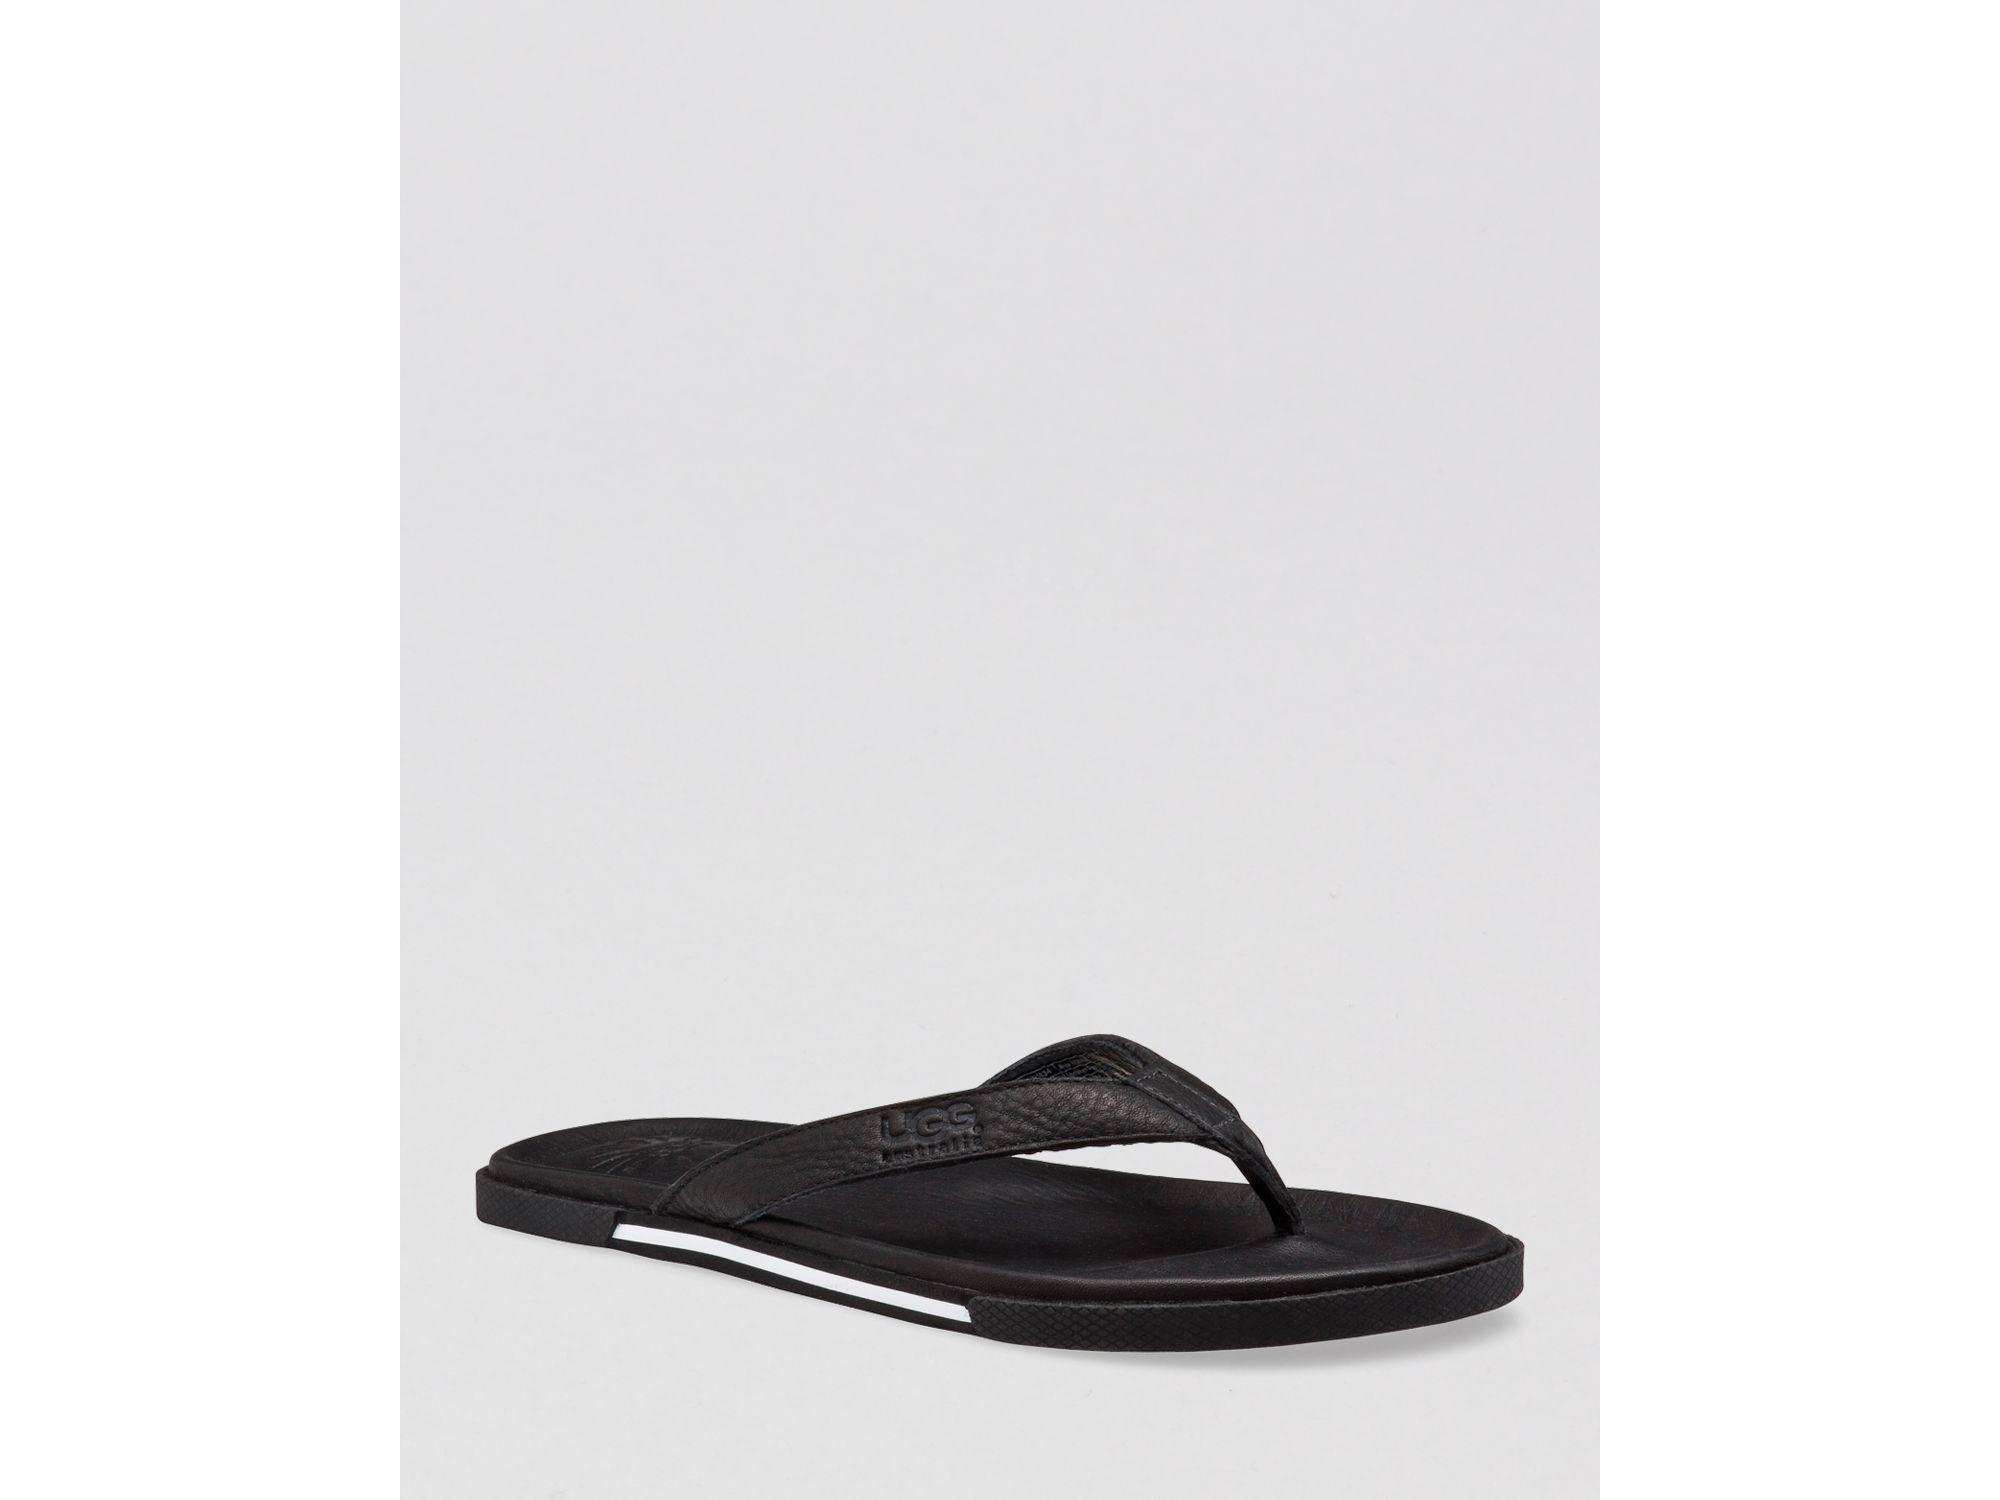 Ugg Australia Bennison Beach Flip Flops In Black For Men  Lyst-2242